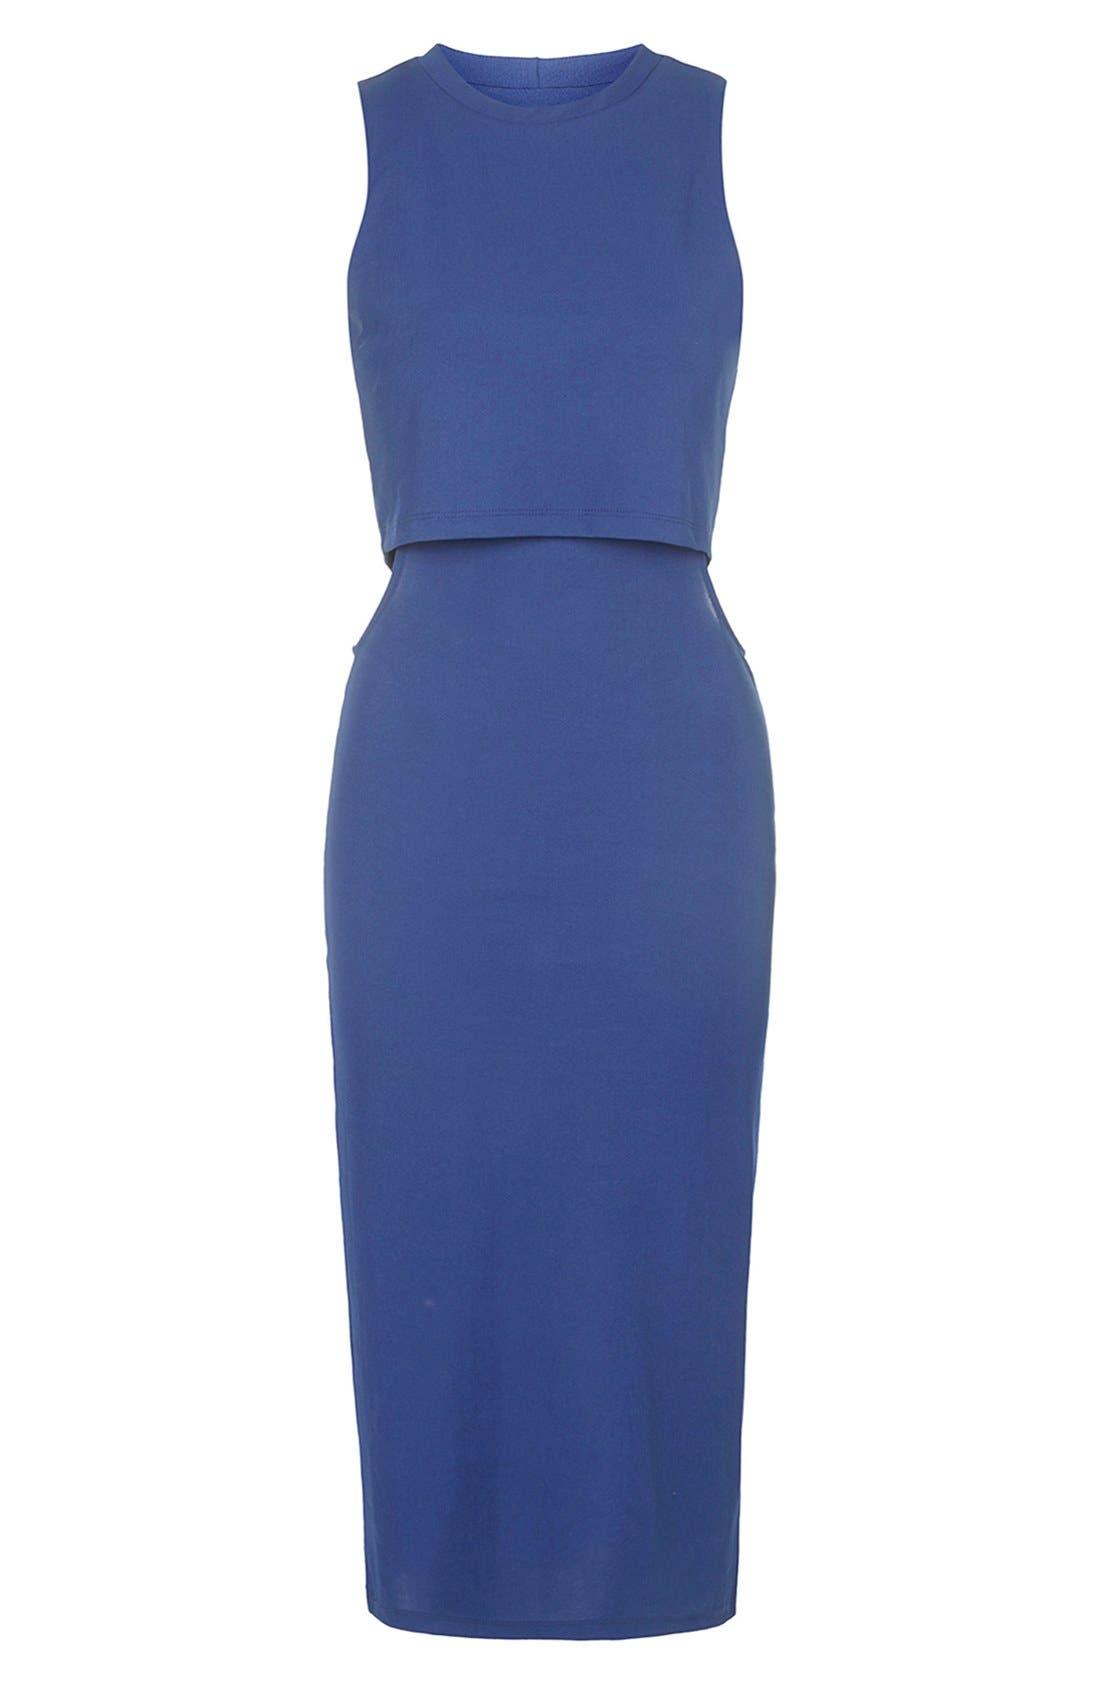 Alternate Image 3  - Topshop Sleeveless Cutout Midi Dress